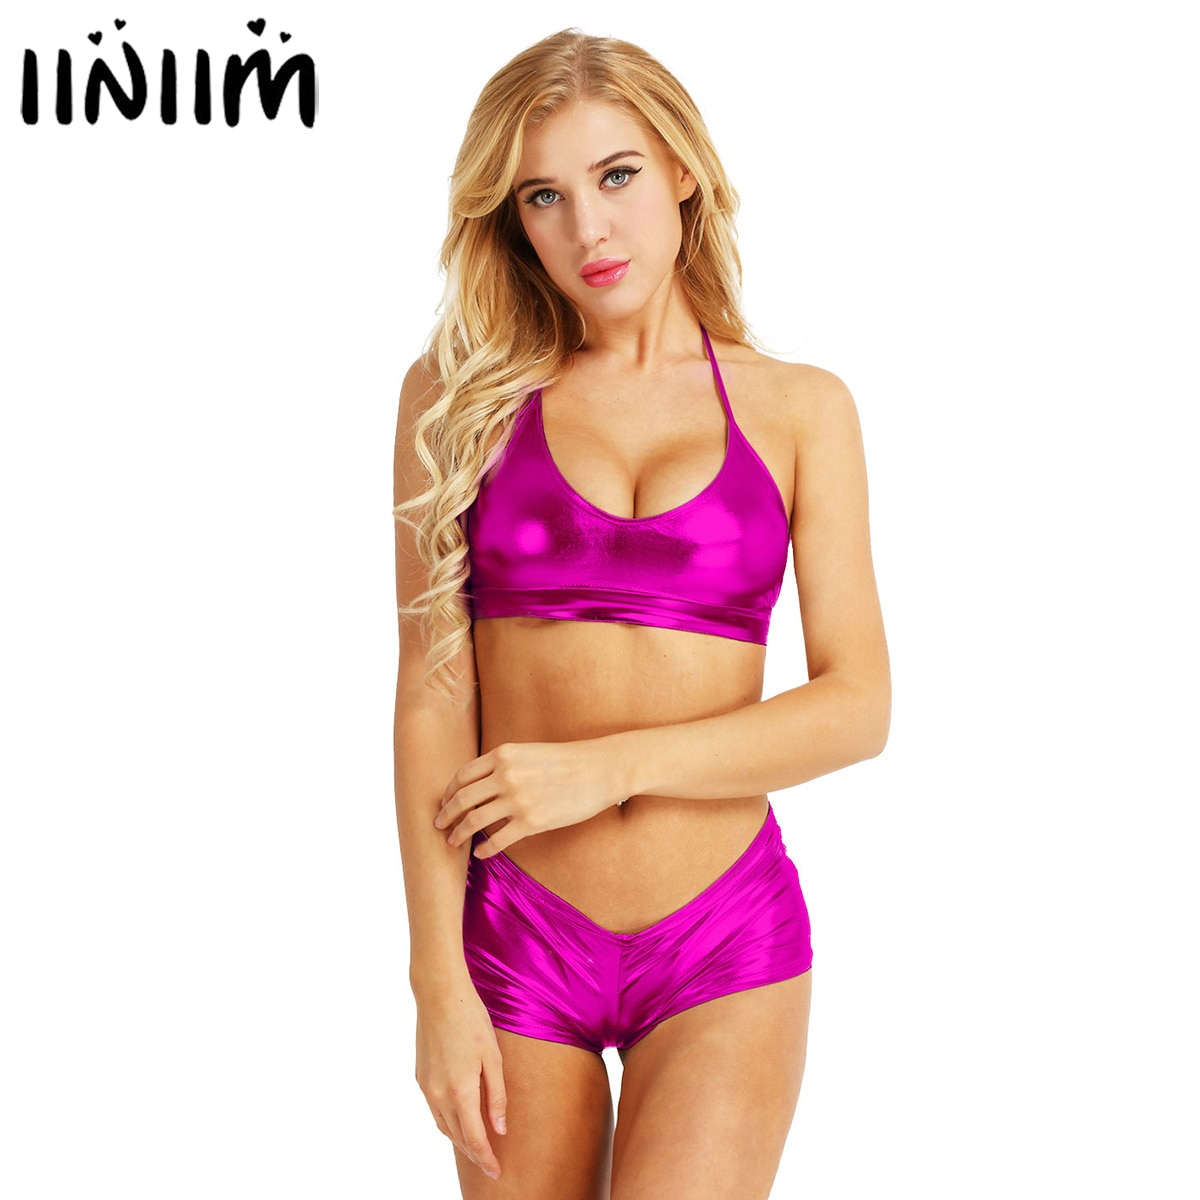 Iiniim 2PCS Frauen Wet Look Sexy Clubwear Faux Leder Dessous Set Bh Top mit Mini Boxer Briefs Unterwäsche Bikini tanz Kostüm